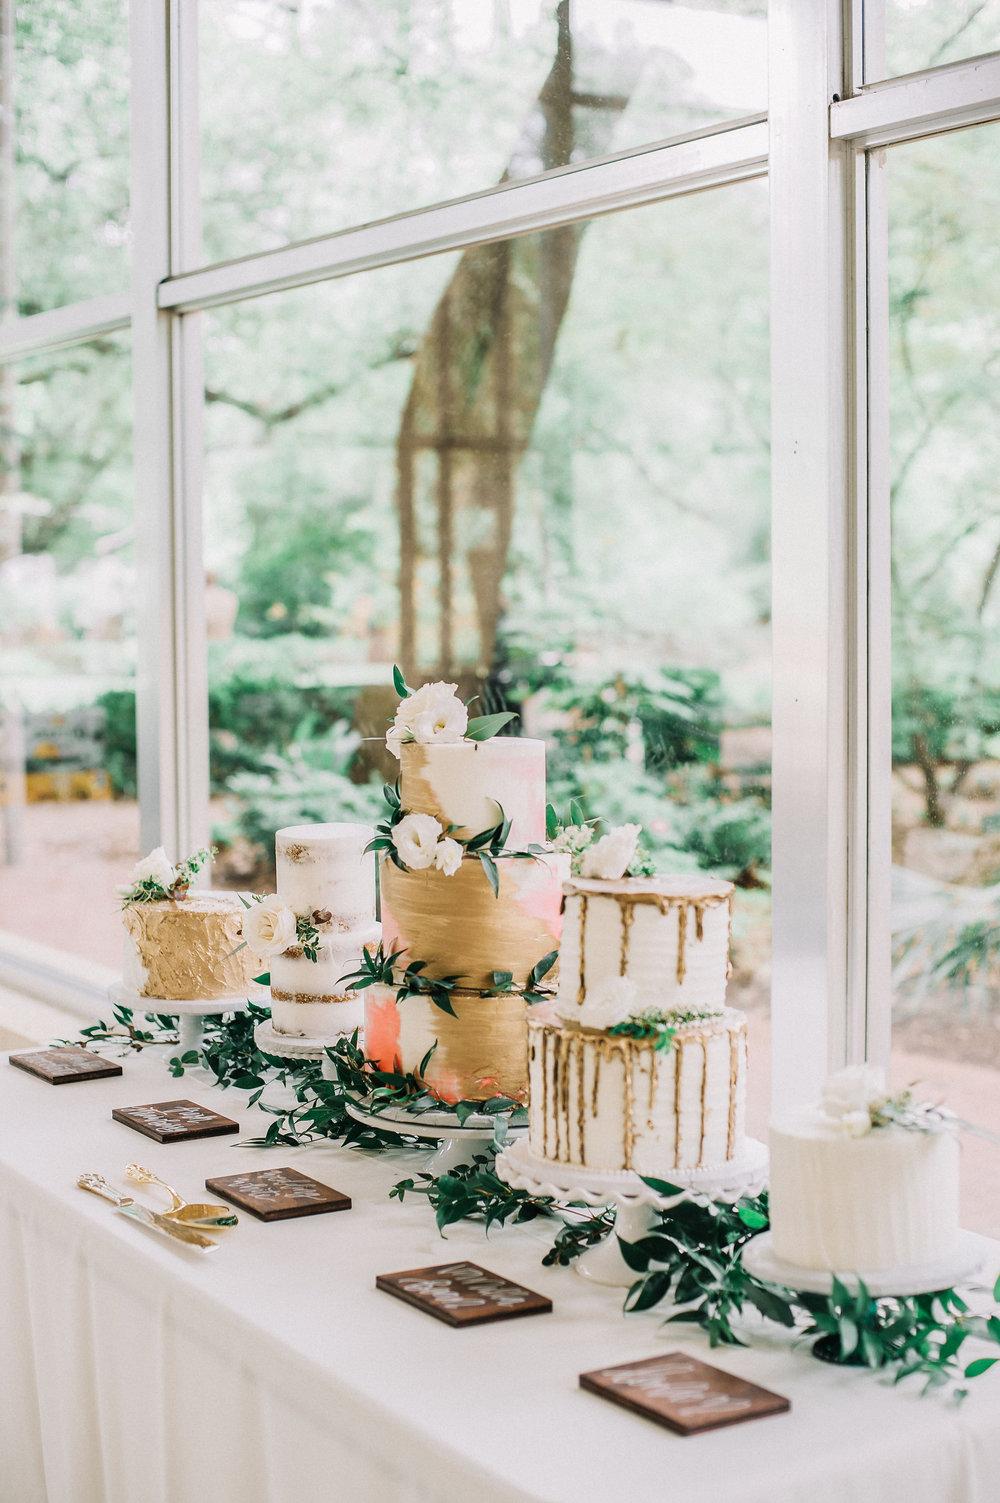 Dallas_Texas_Discovery_Gardens_Wedding_VanessaAlvin0397.jpg